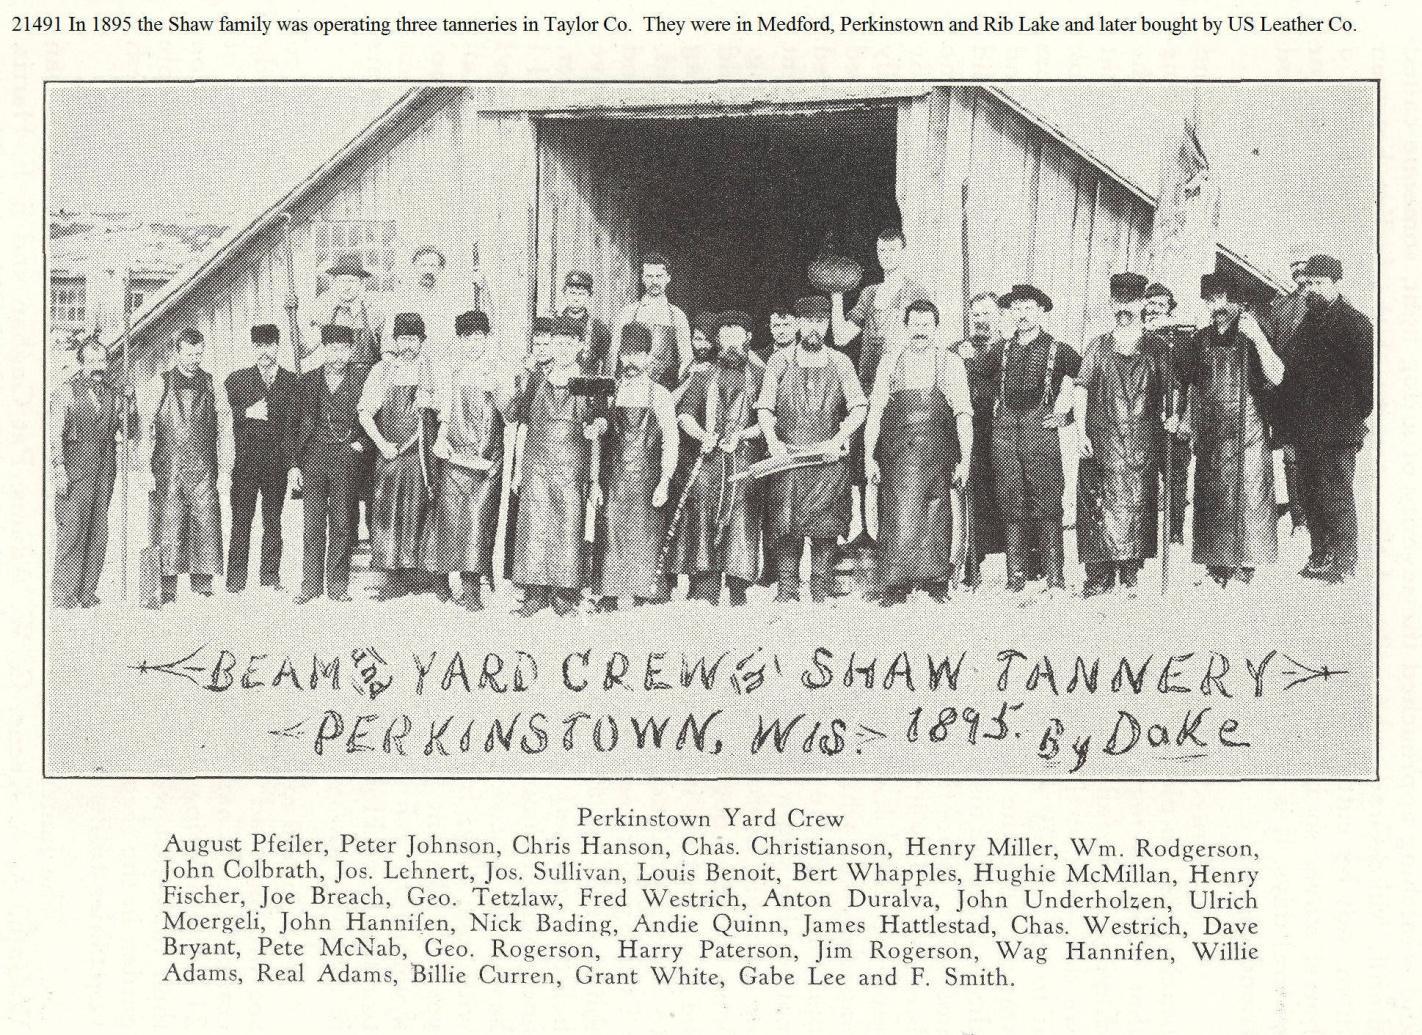 "C:\Users\Robert P. Rusch\Desktop\II. RLHSoc\Documents & Photos-Scanned\Rib Lake History 21400-21499\21491 P. 1895 ""Beam and Yard Crew of Shaw Tannery, Perkinstown, Wis. 1895 by Dake"".jpg"